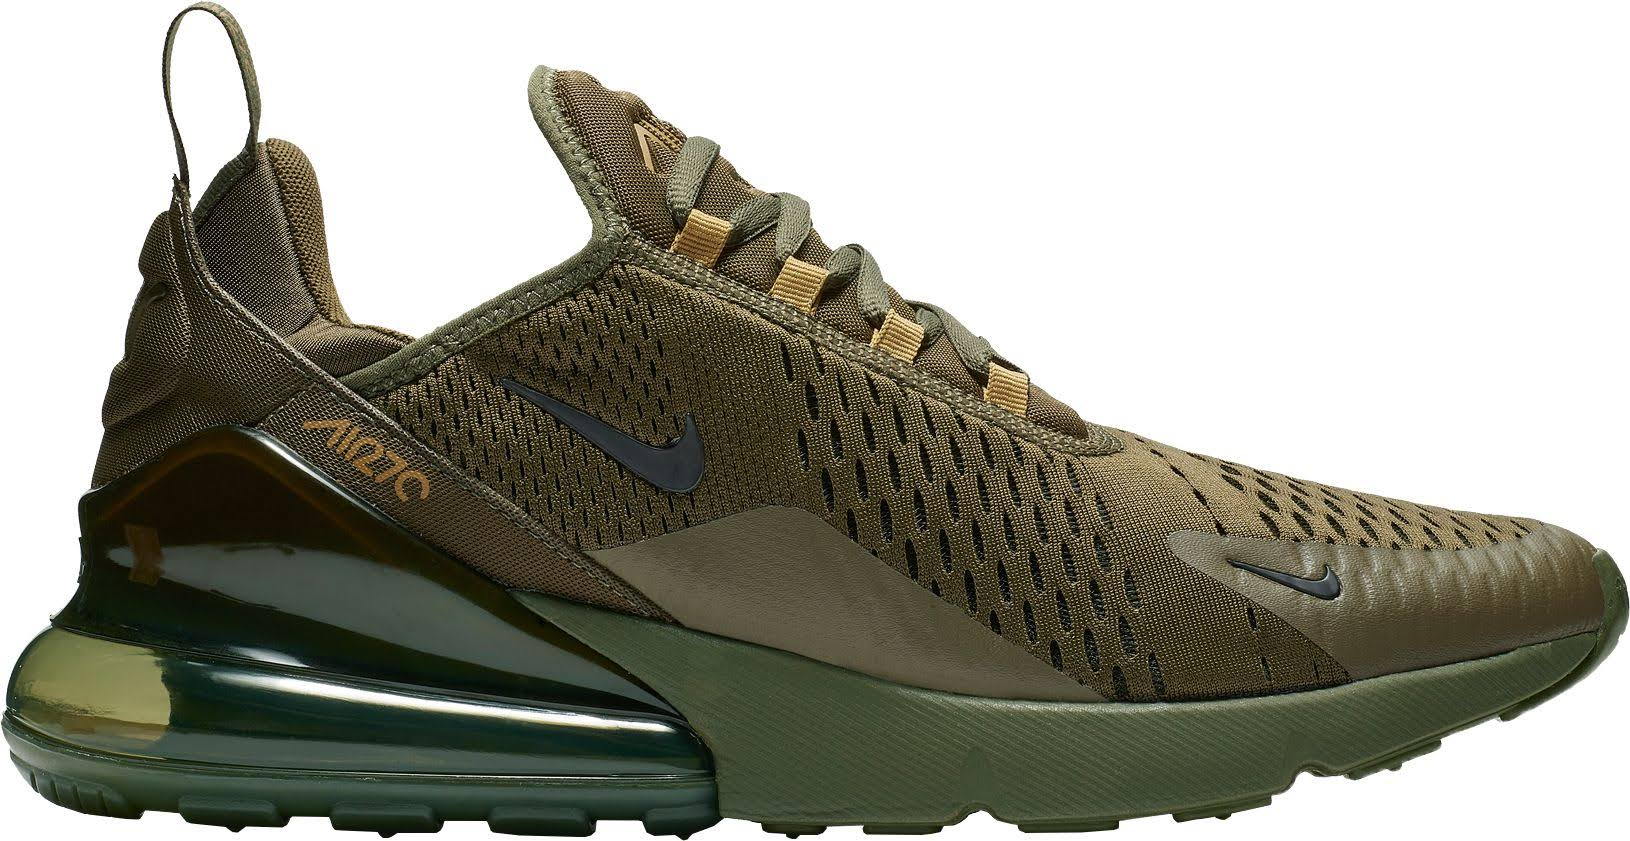 Talla 270 8 Zapatillas 0 Canvas Para Nike Air Max Olive Hombre 0xqq4pYt